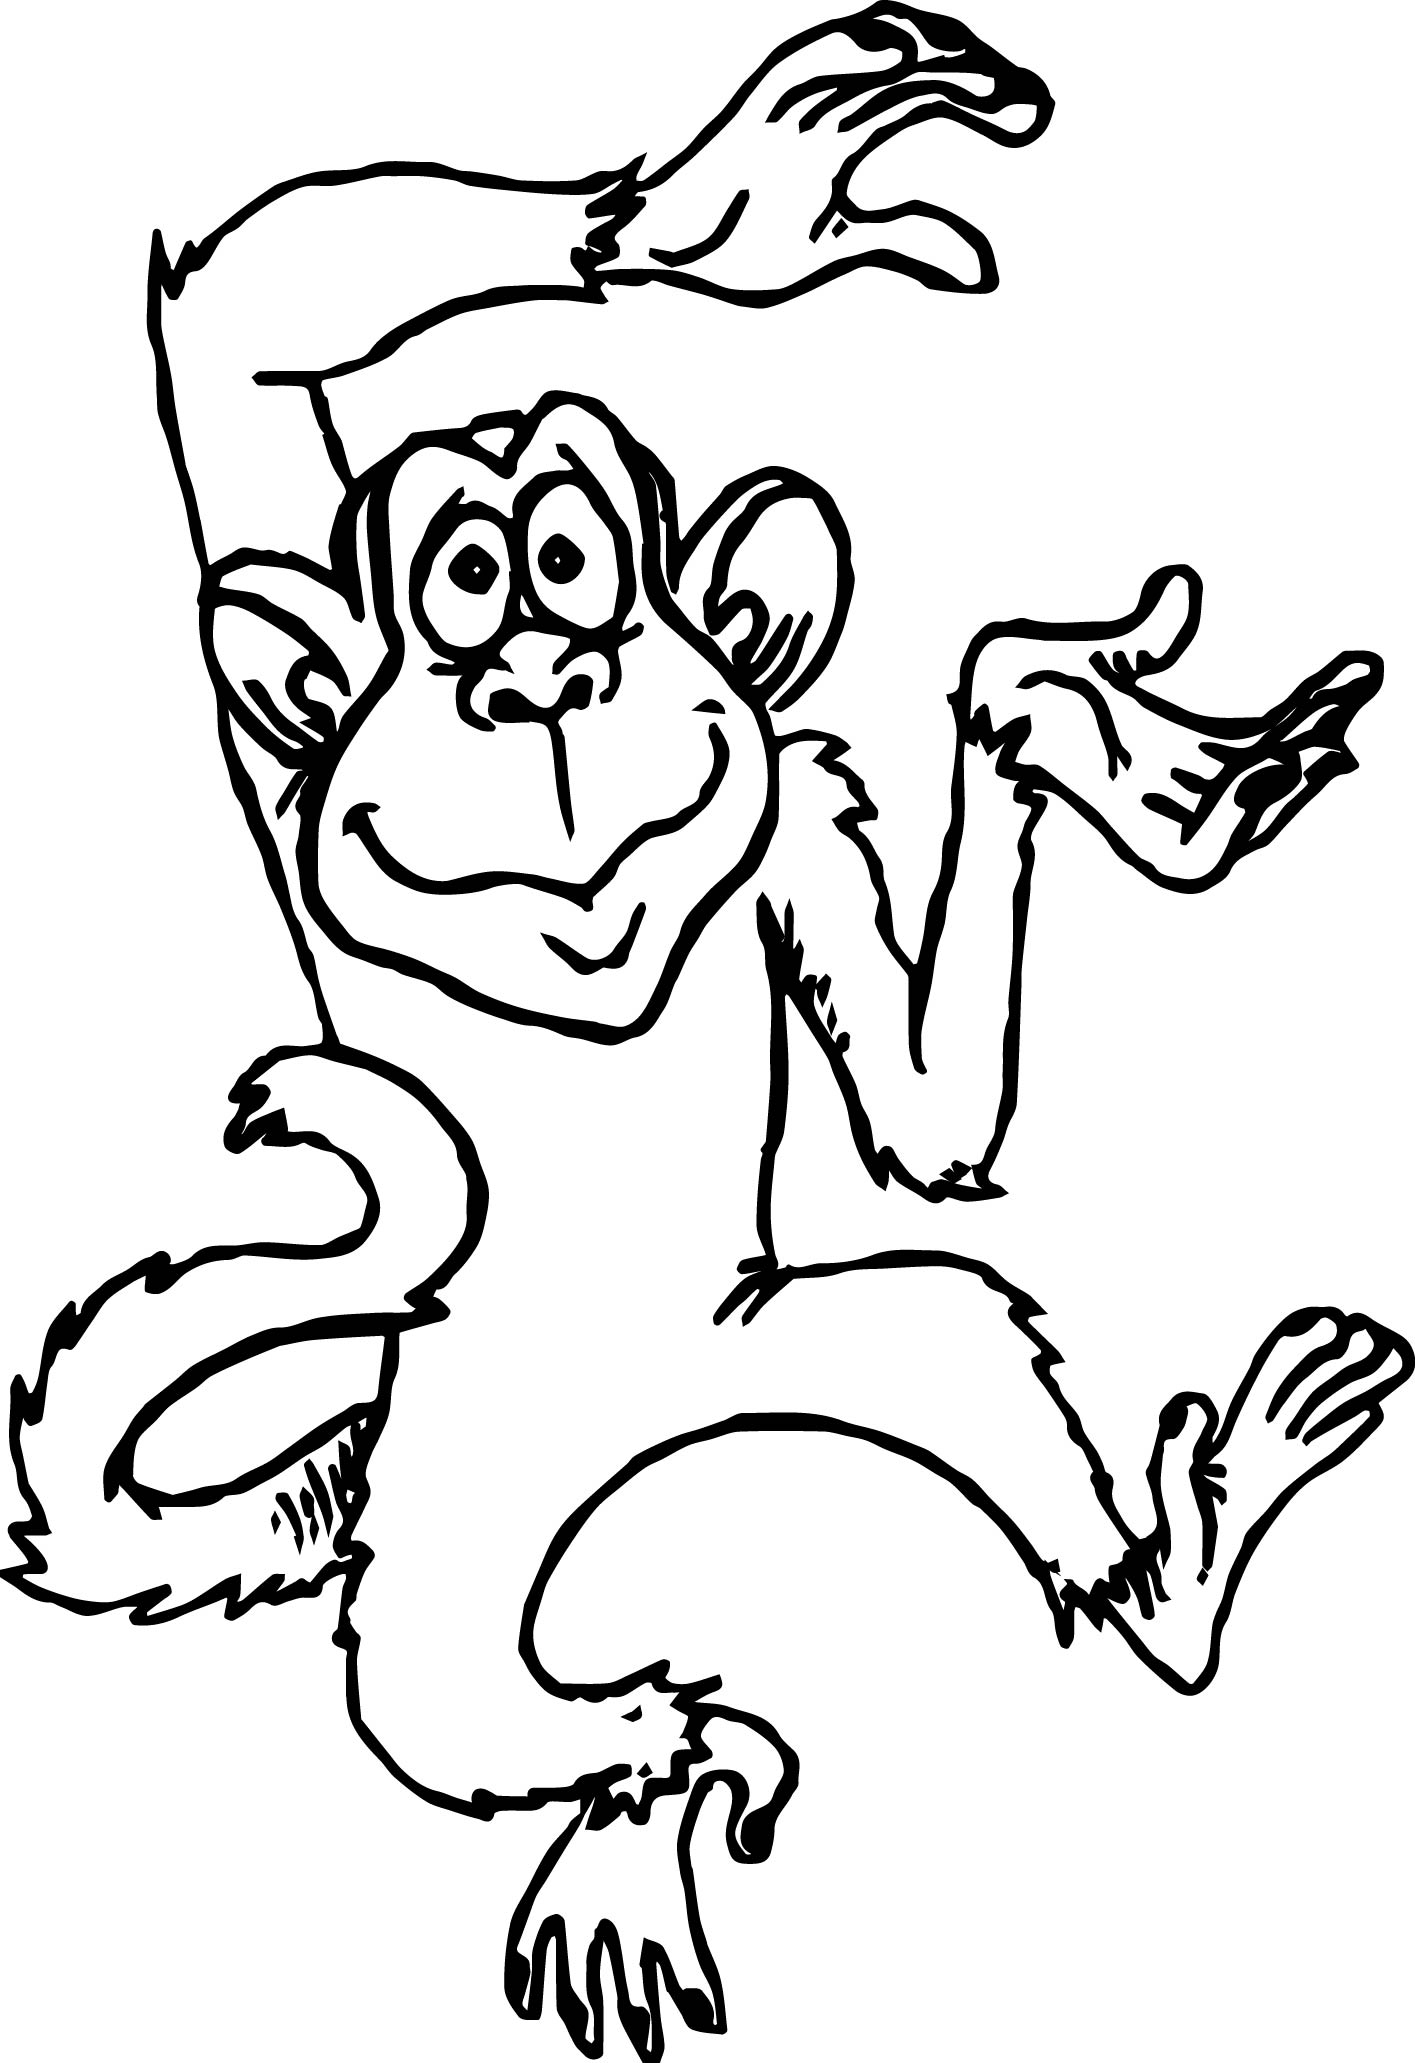 Cute Monkey Drawing | Free download best Cute Monkey Drawing on ...